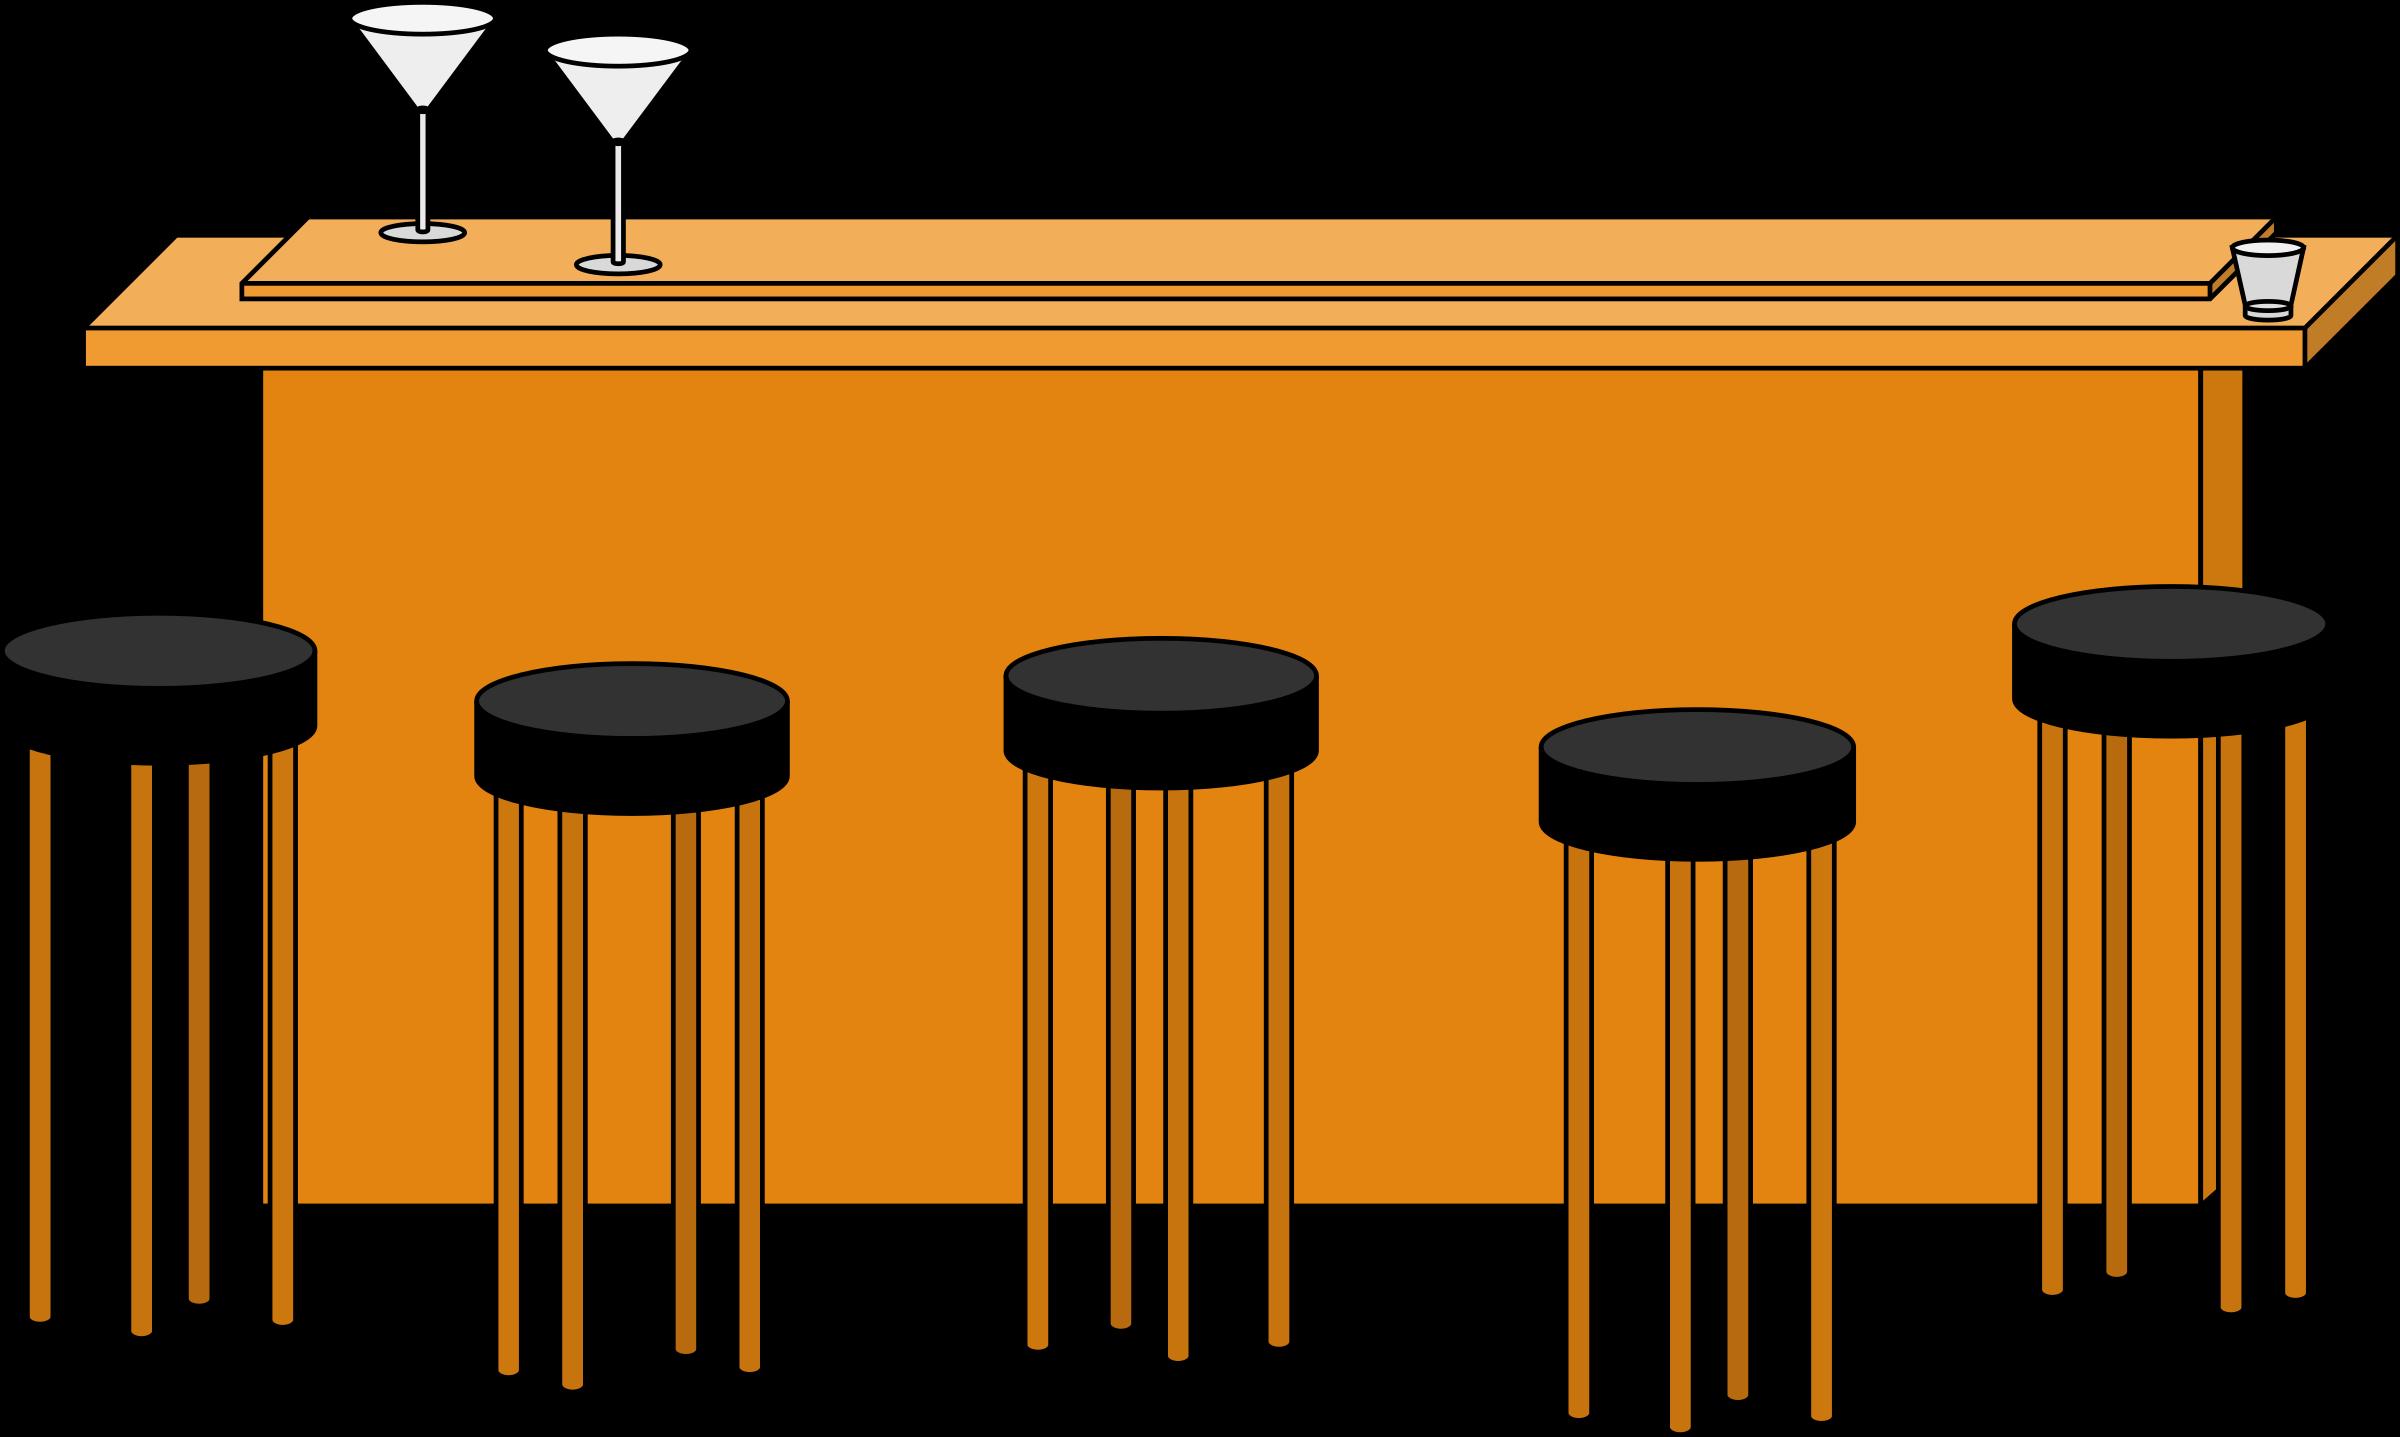 Bar clipart #9